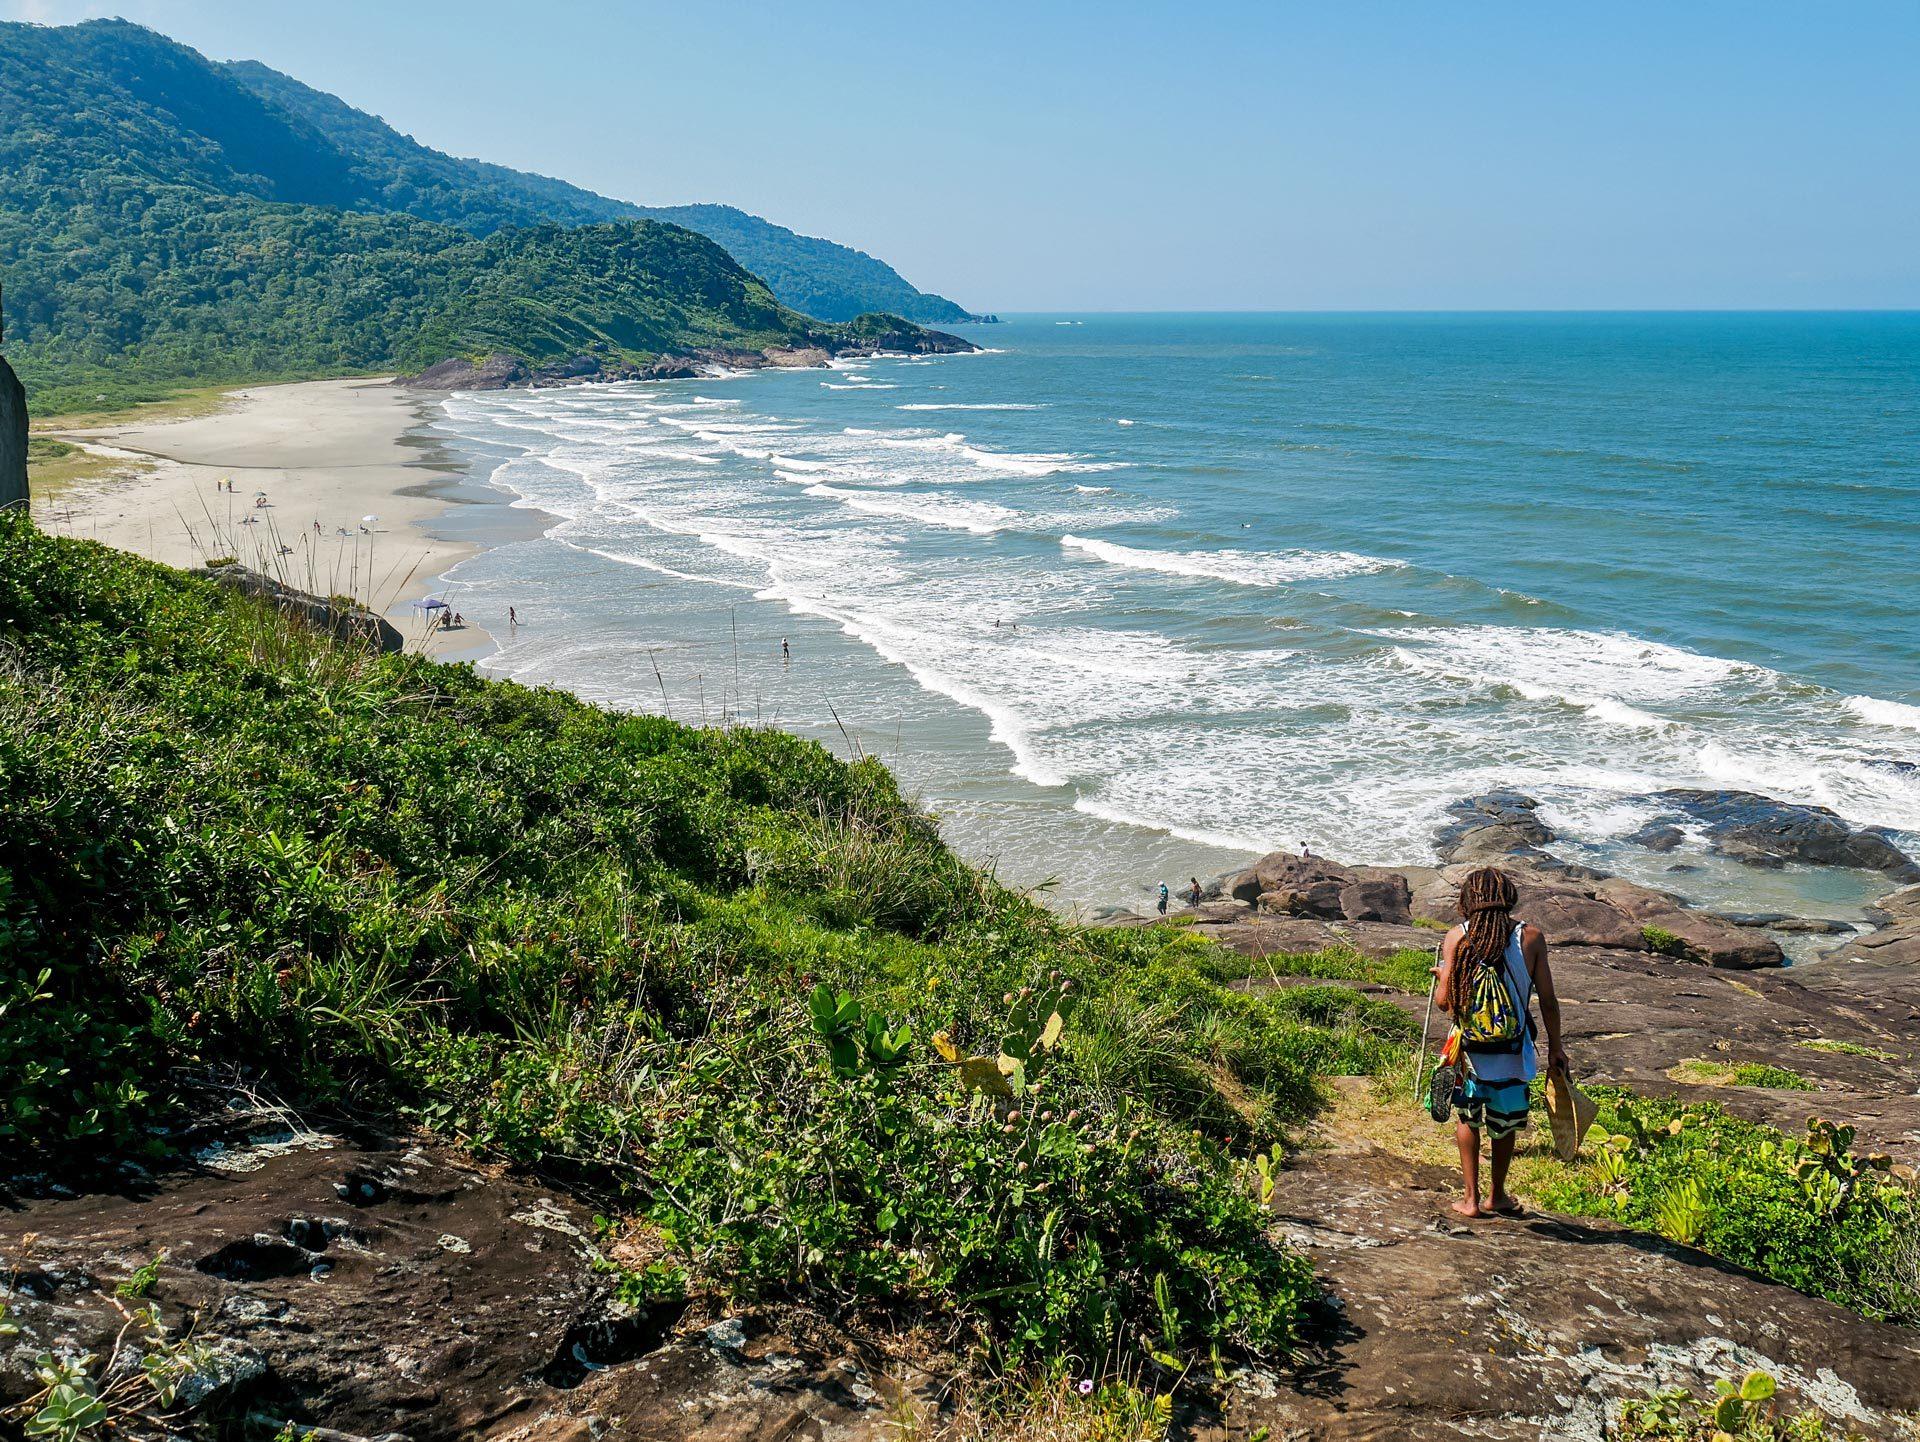 Rastaman hiking on cliff in Barra do Una, Brazil